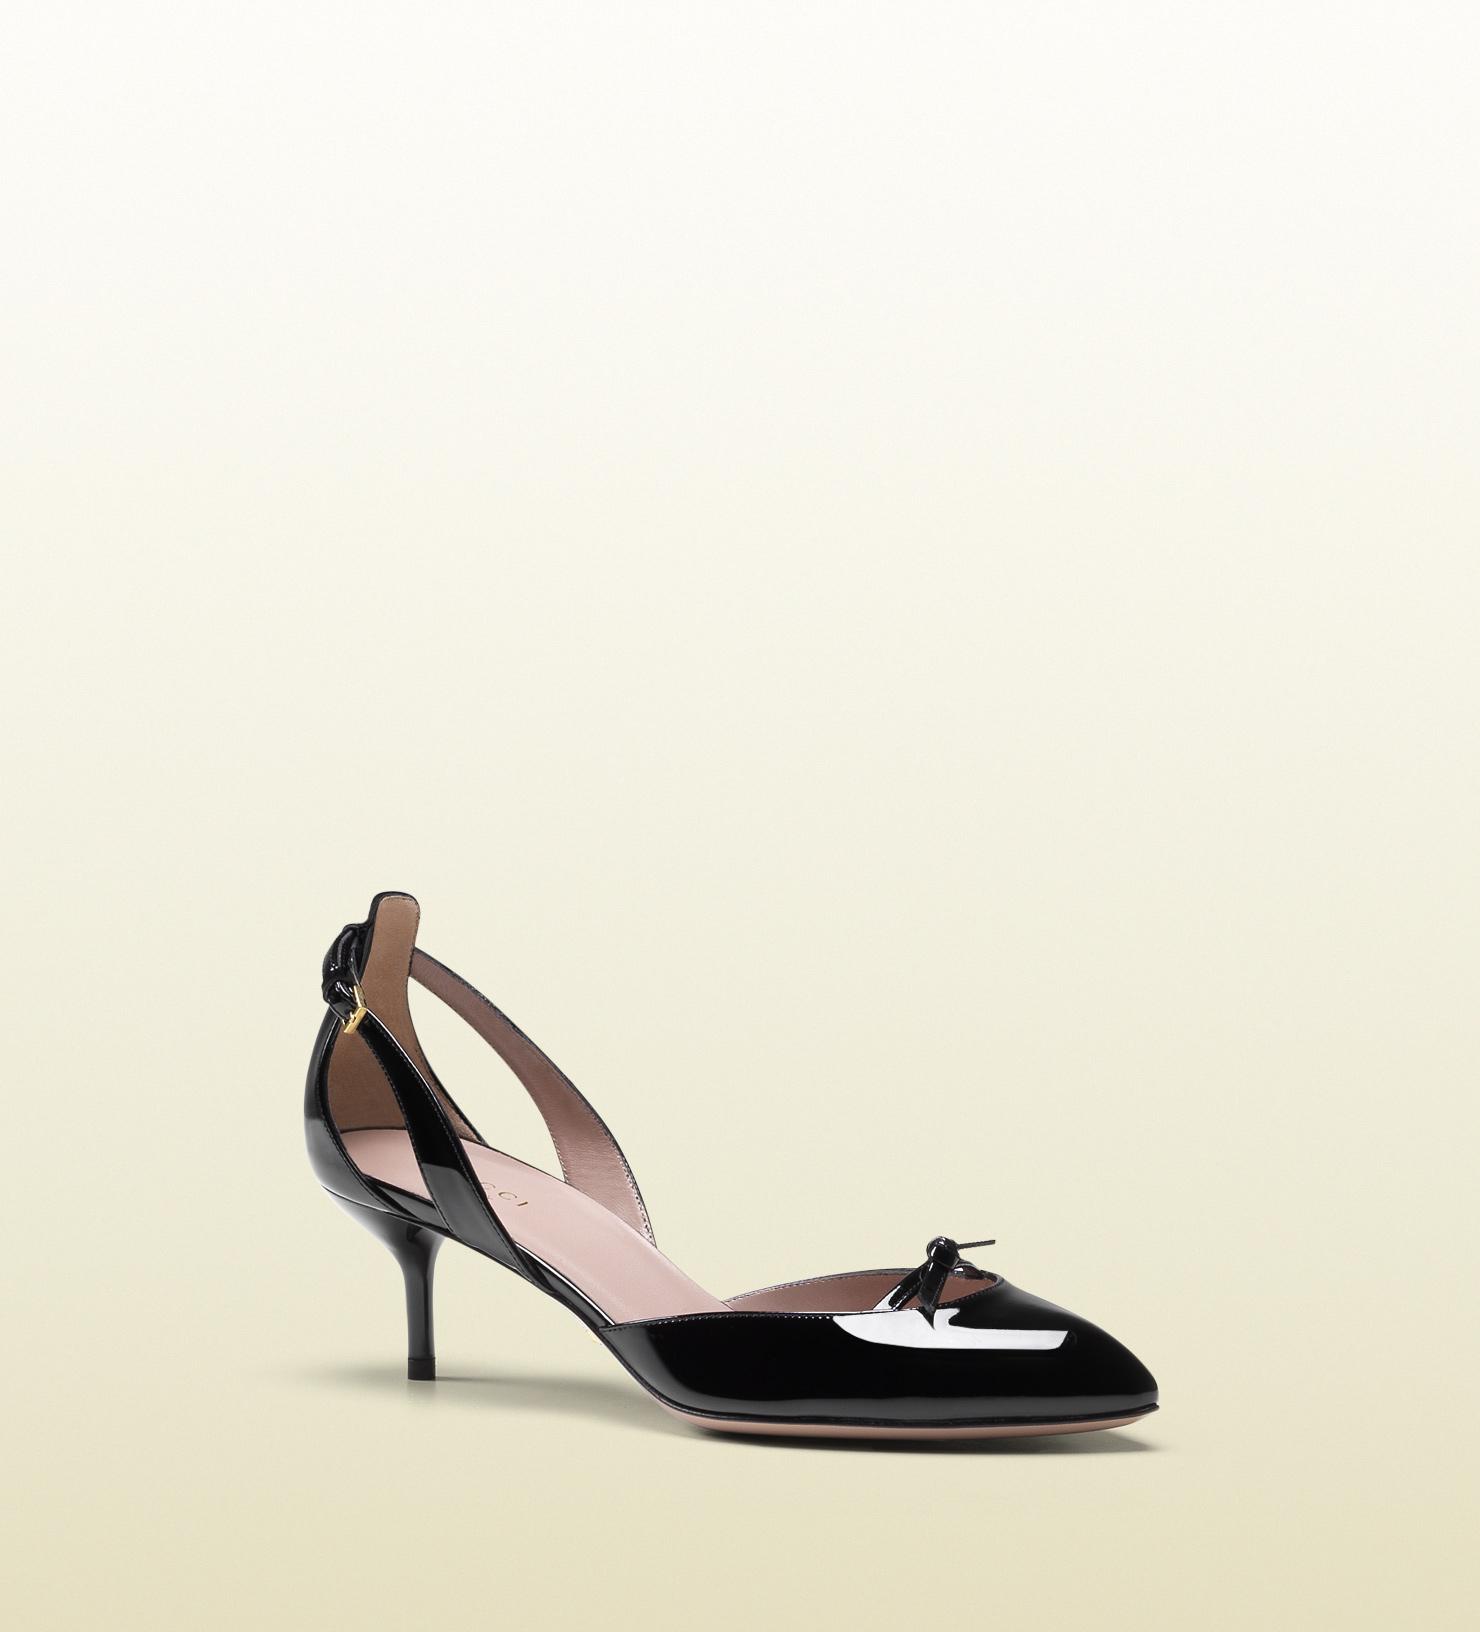 bd7aca53ad40 Lyst - Gucci Black Patent Leather Mid-heel Pump in Black